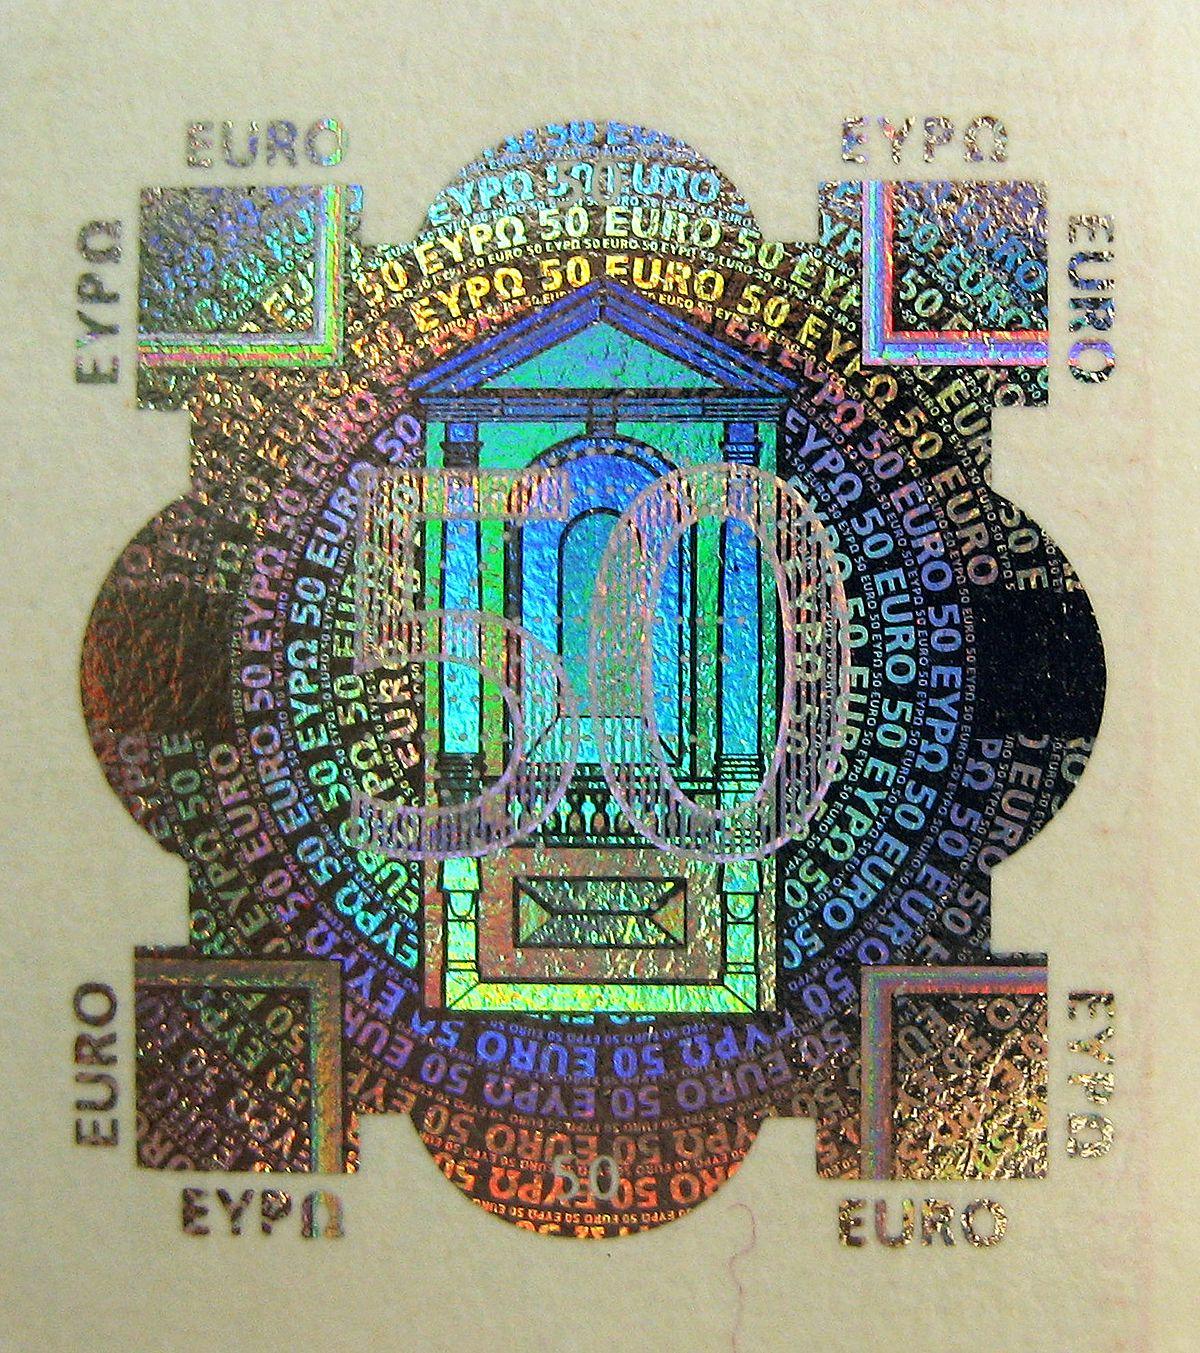 Billets De Banque En Euros Wikipedia